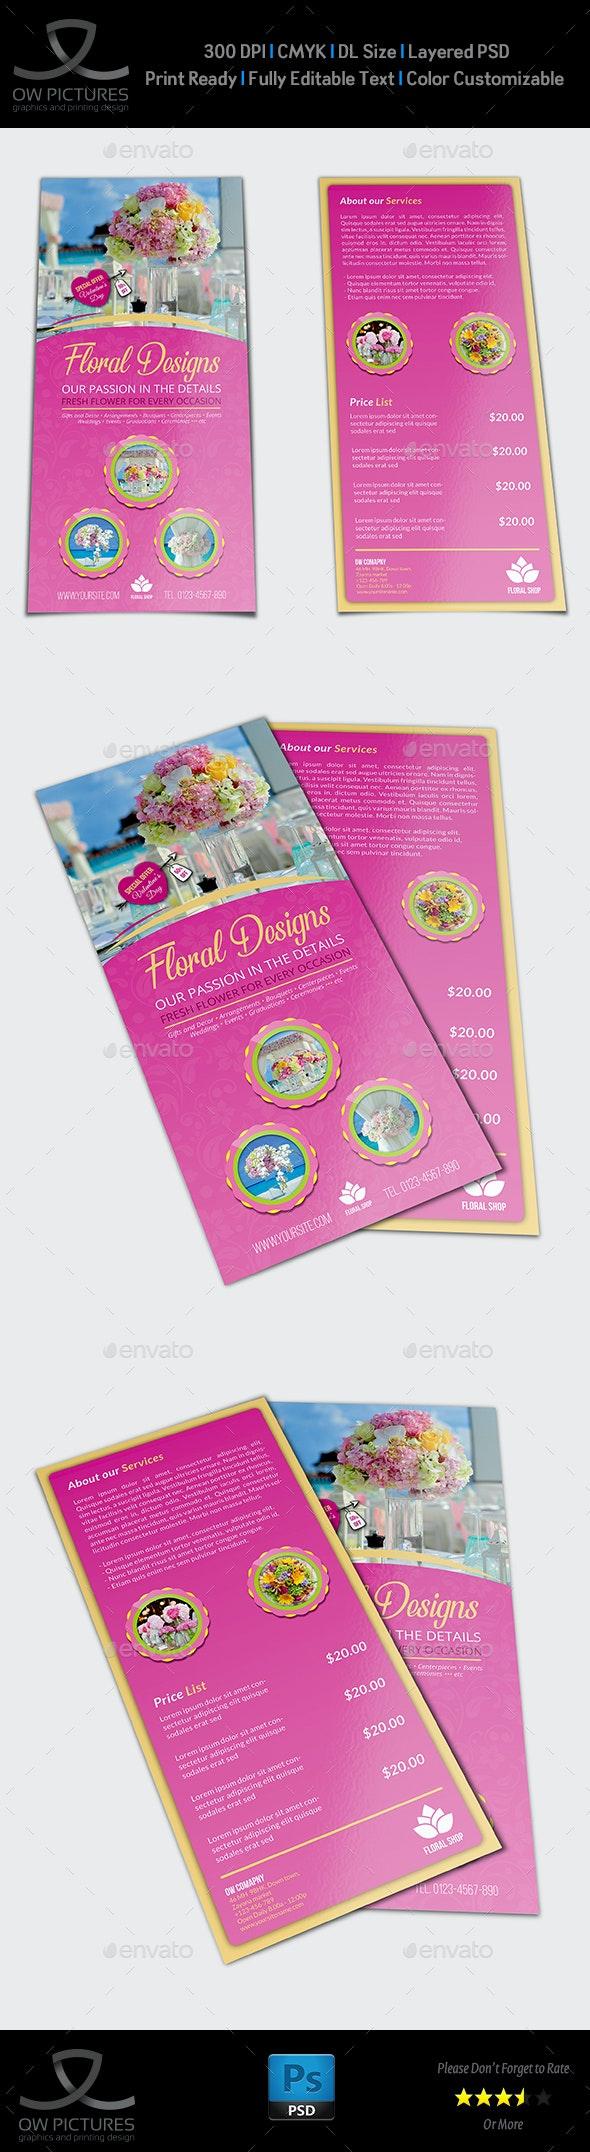 Floral Designs Flyer DL Size Template - Events Flyers